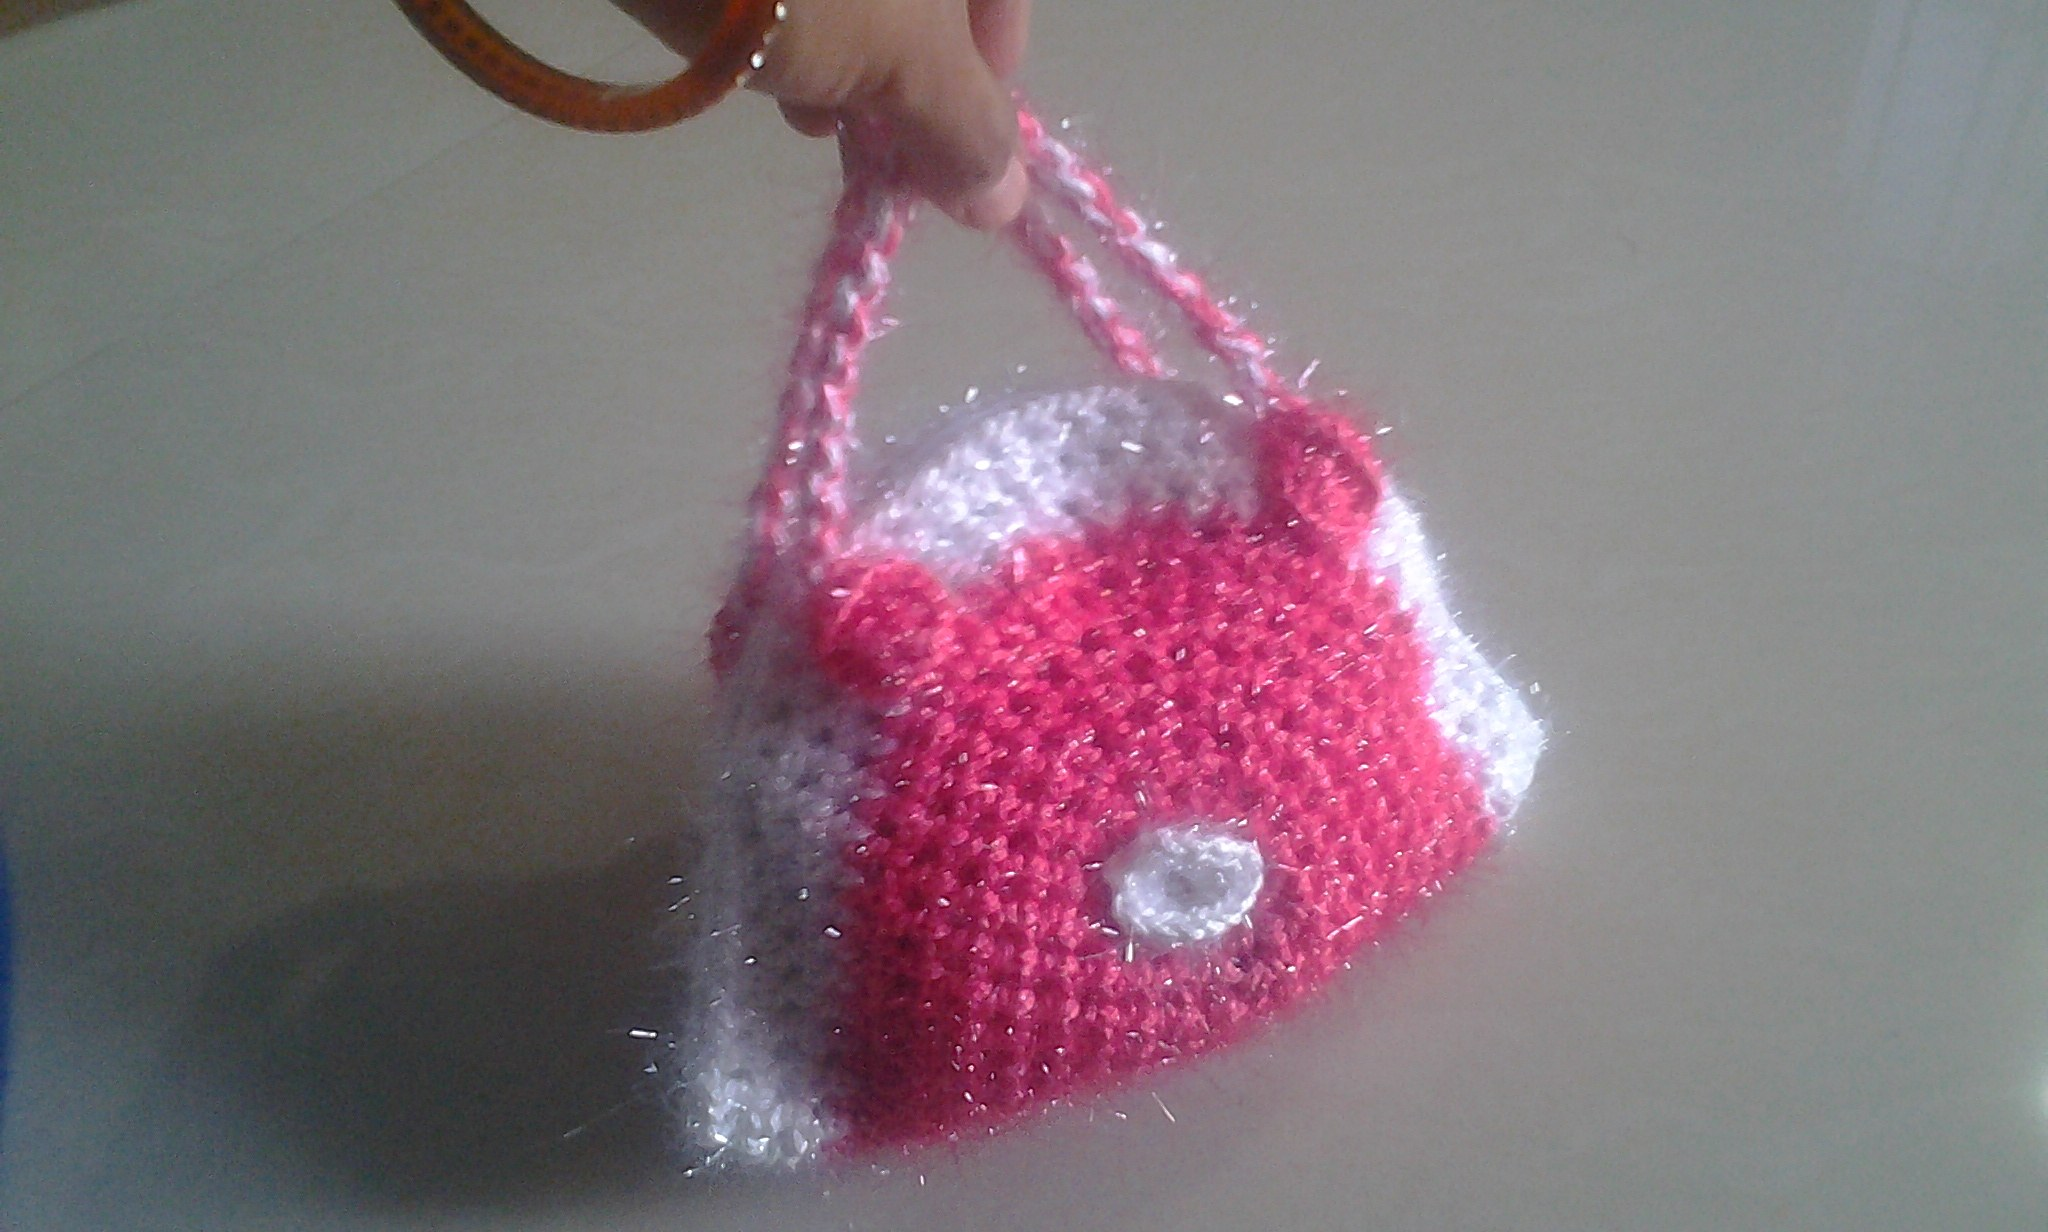 Batwa Purse Making : Crochet Hand Bag Small-Bags-Crochet Passion